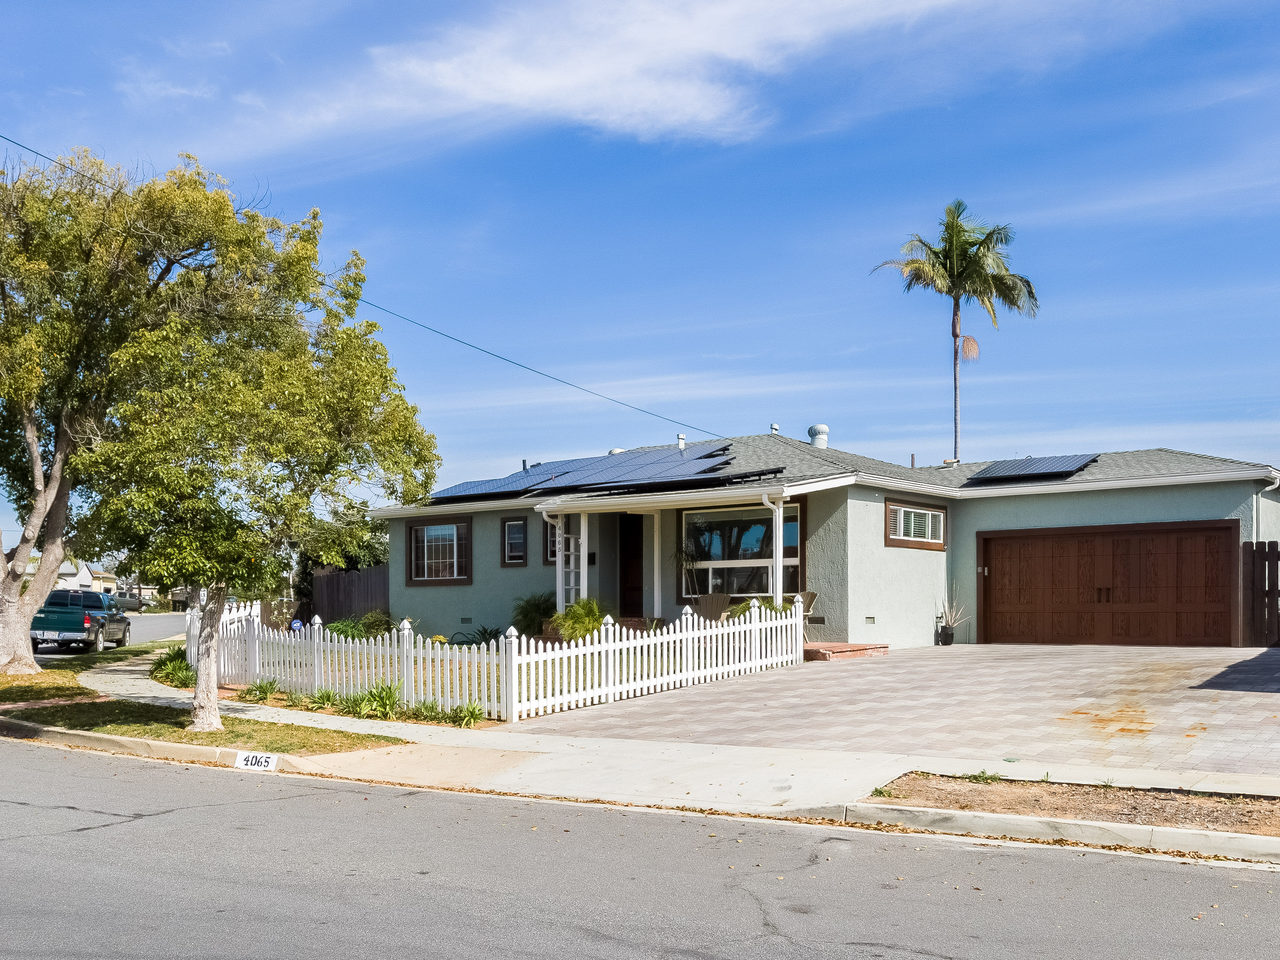 4065 Gros Ventre Ave San Diego-MLS_Size-028-42-4065 Gros Ventre 29 of 29-1280x960-72dpi.jpg